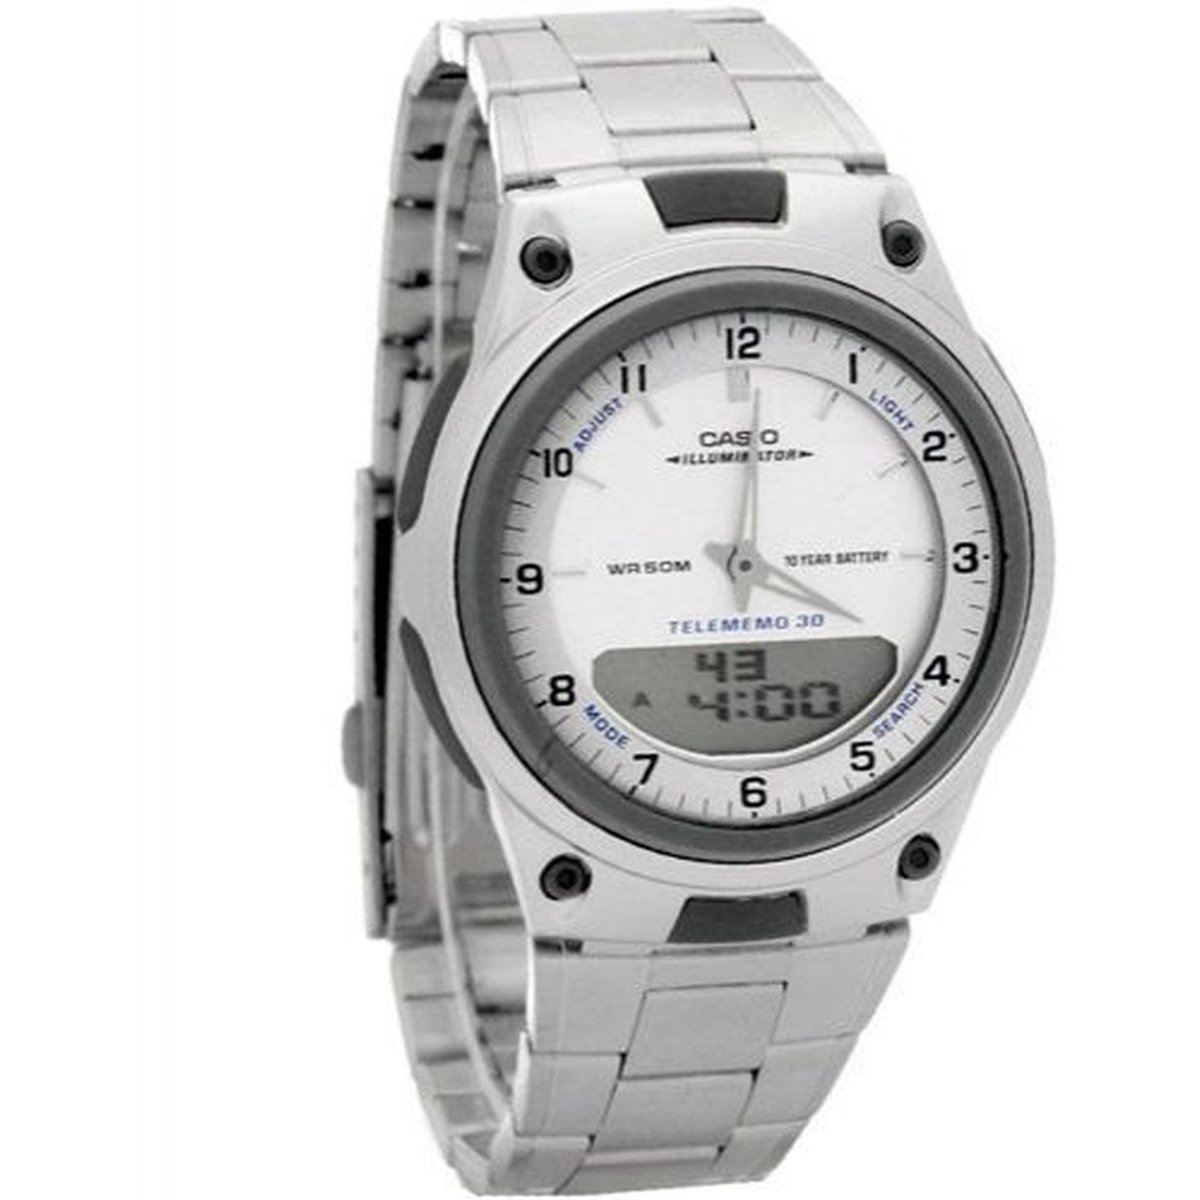 0aa63976395 Relógio Masculino Casio Analogico Digital Esportivo - Compre Agora ...